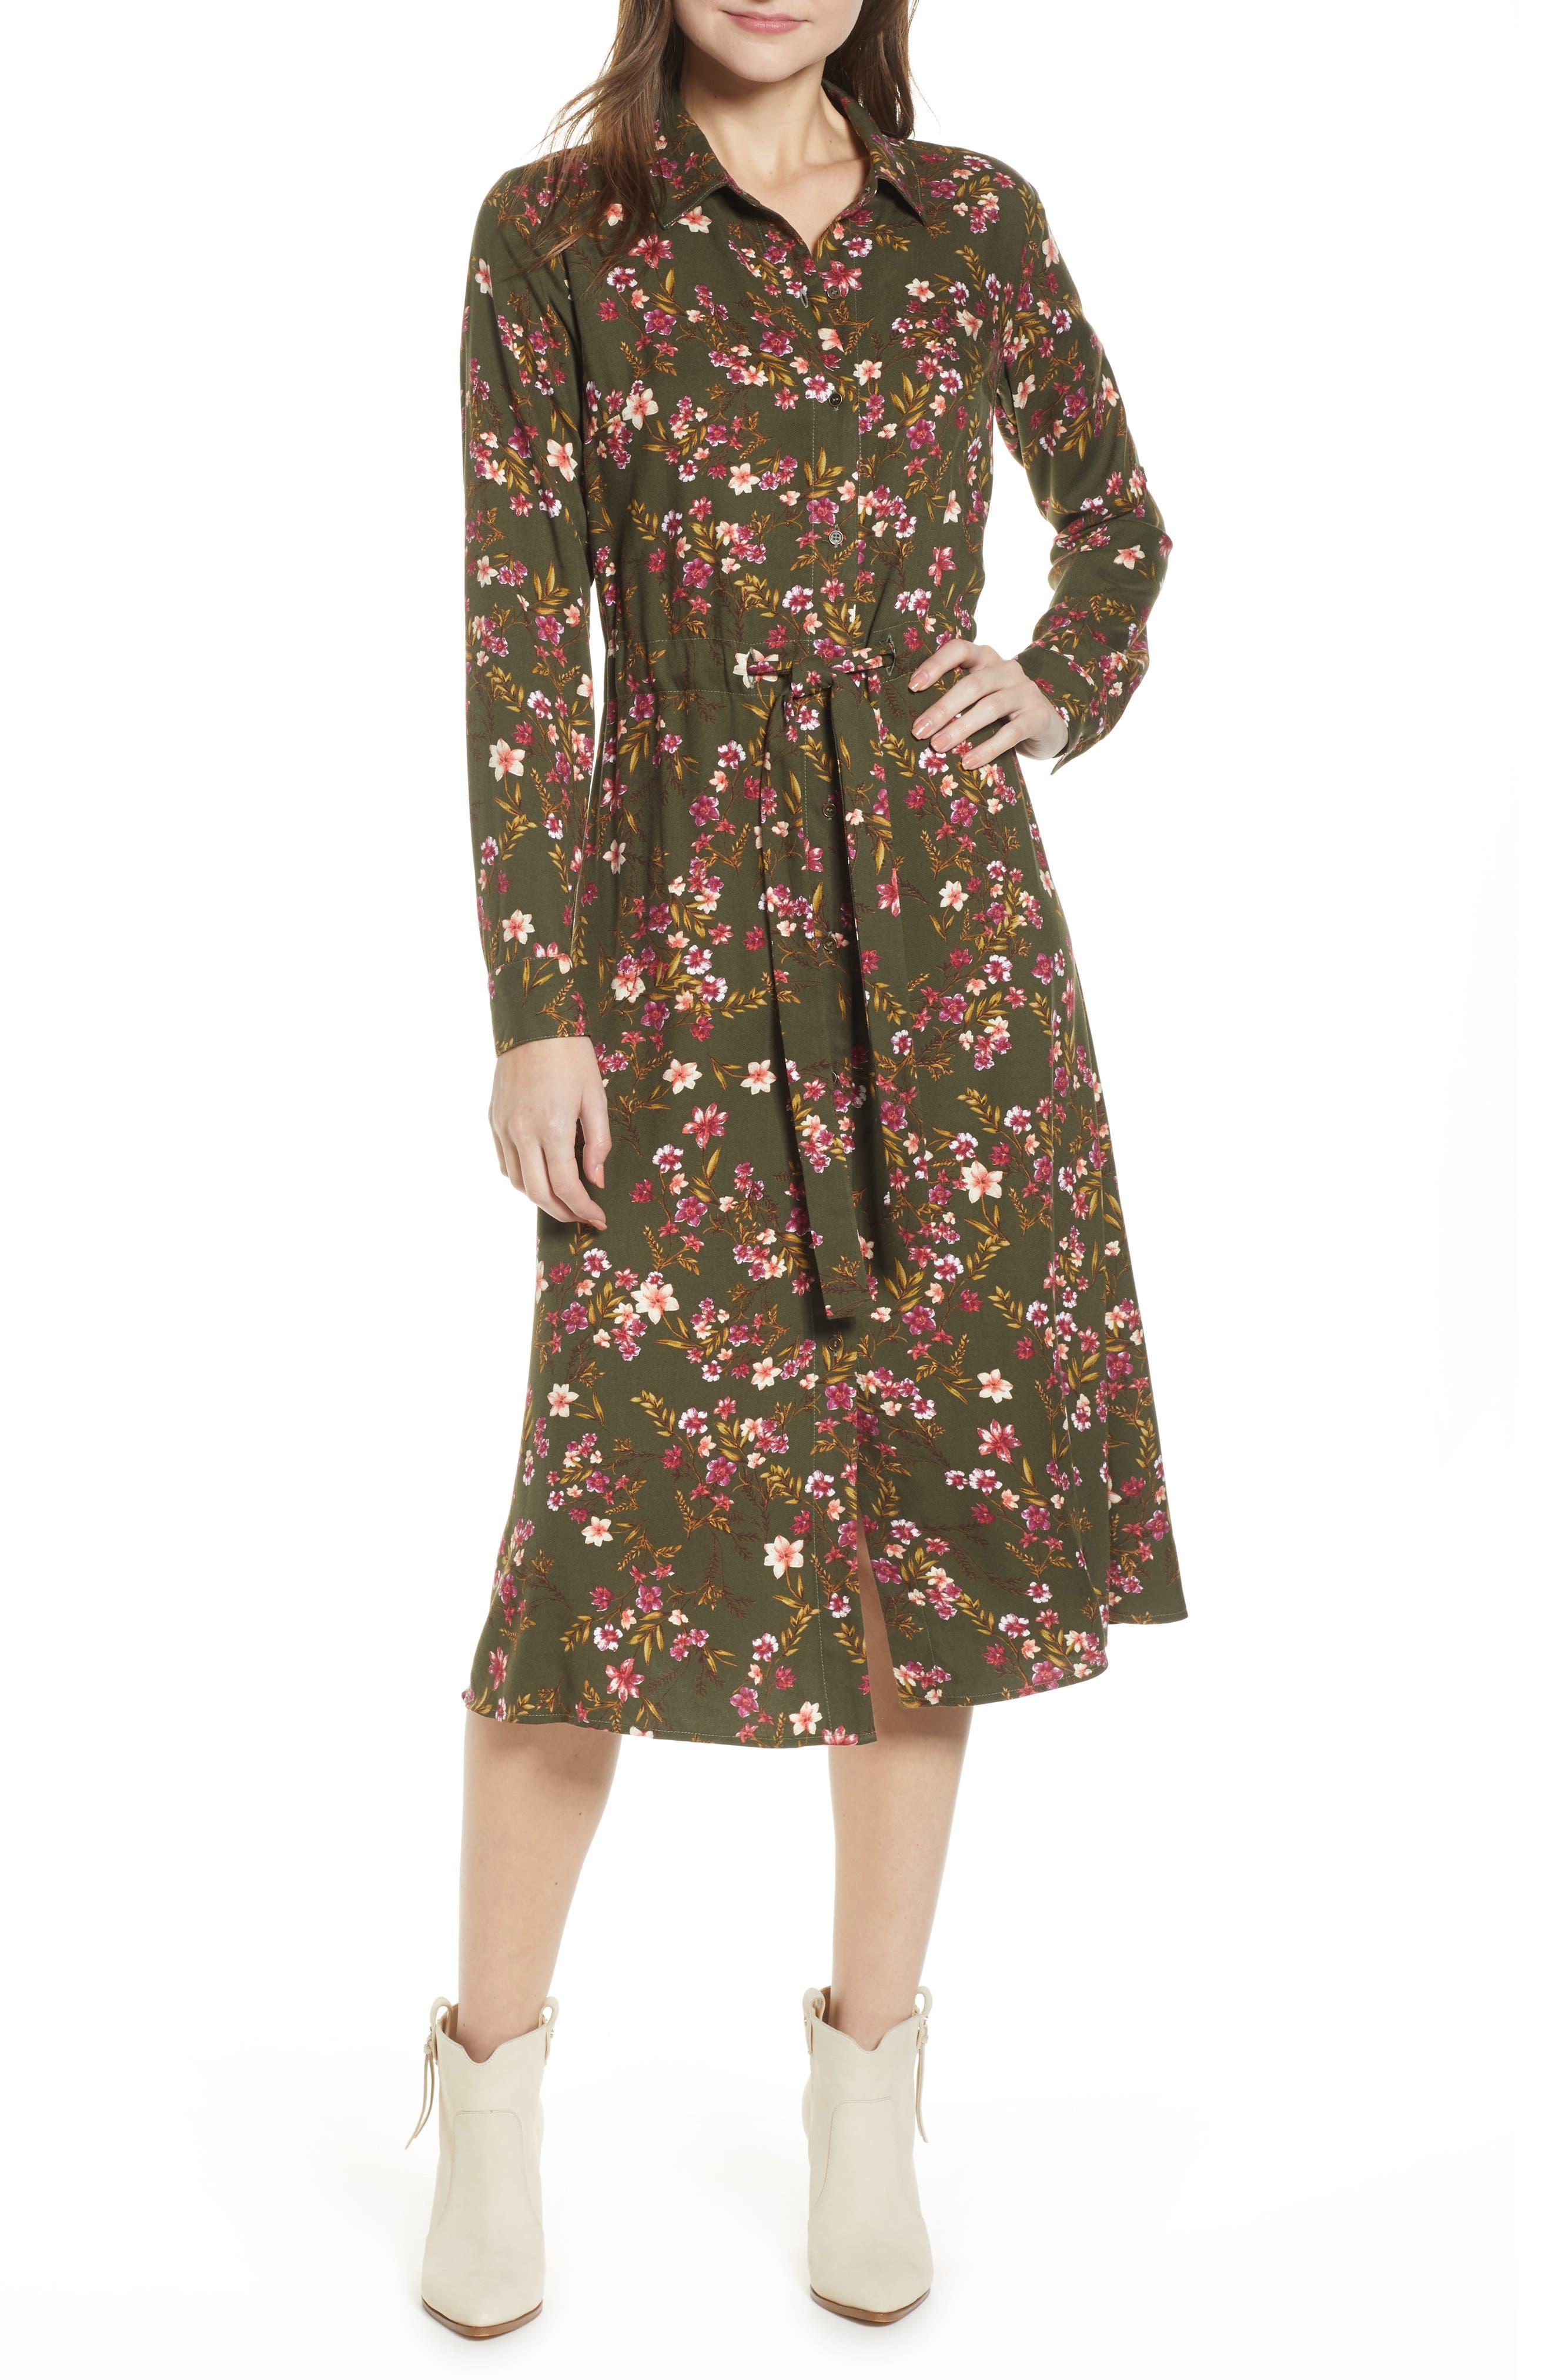 BP., Floral Midi Dress, Main thumbnail 1, color, OLIVE BURNT SAVANNAH FLORAL